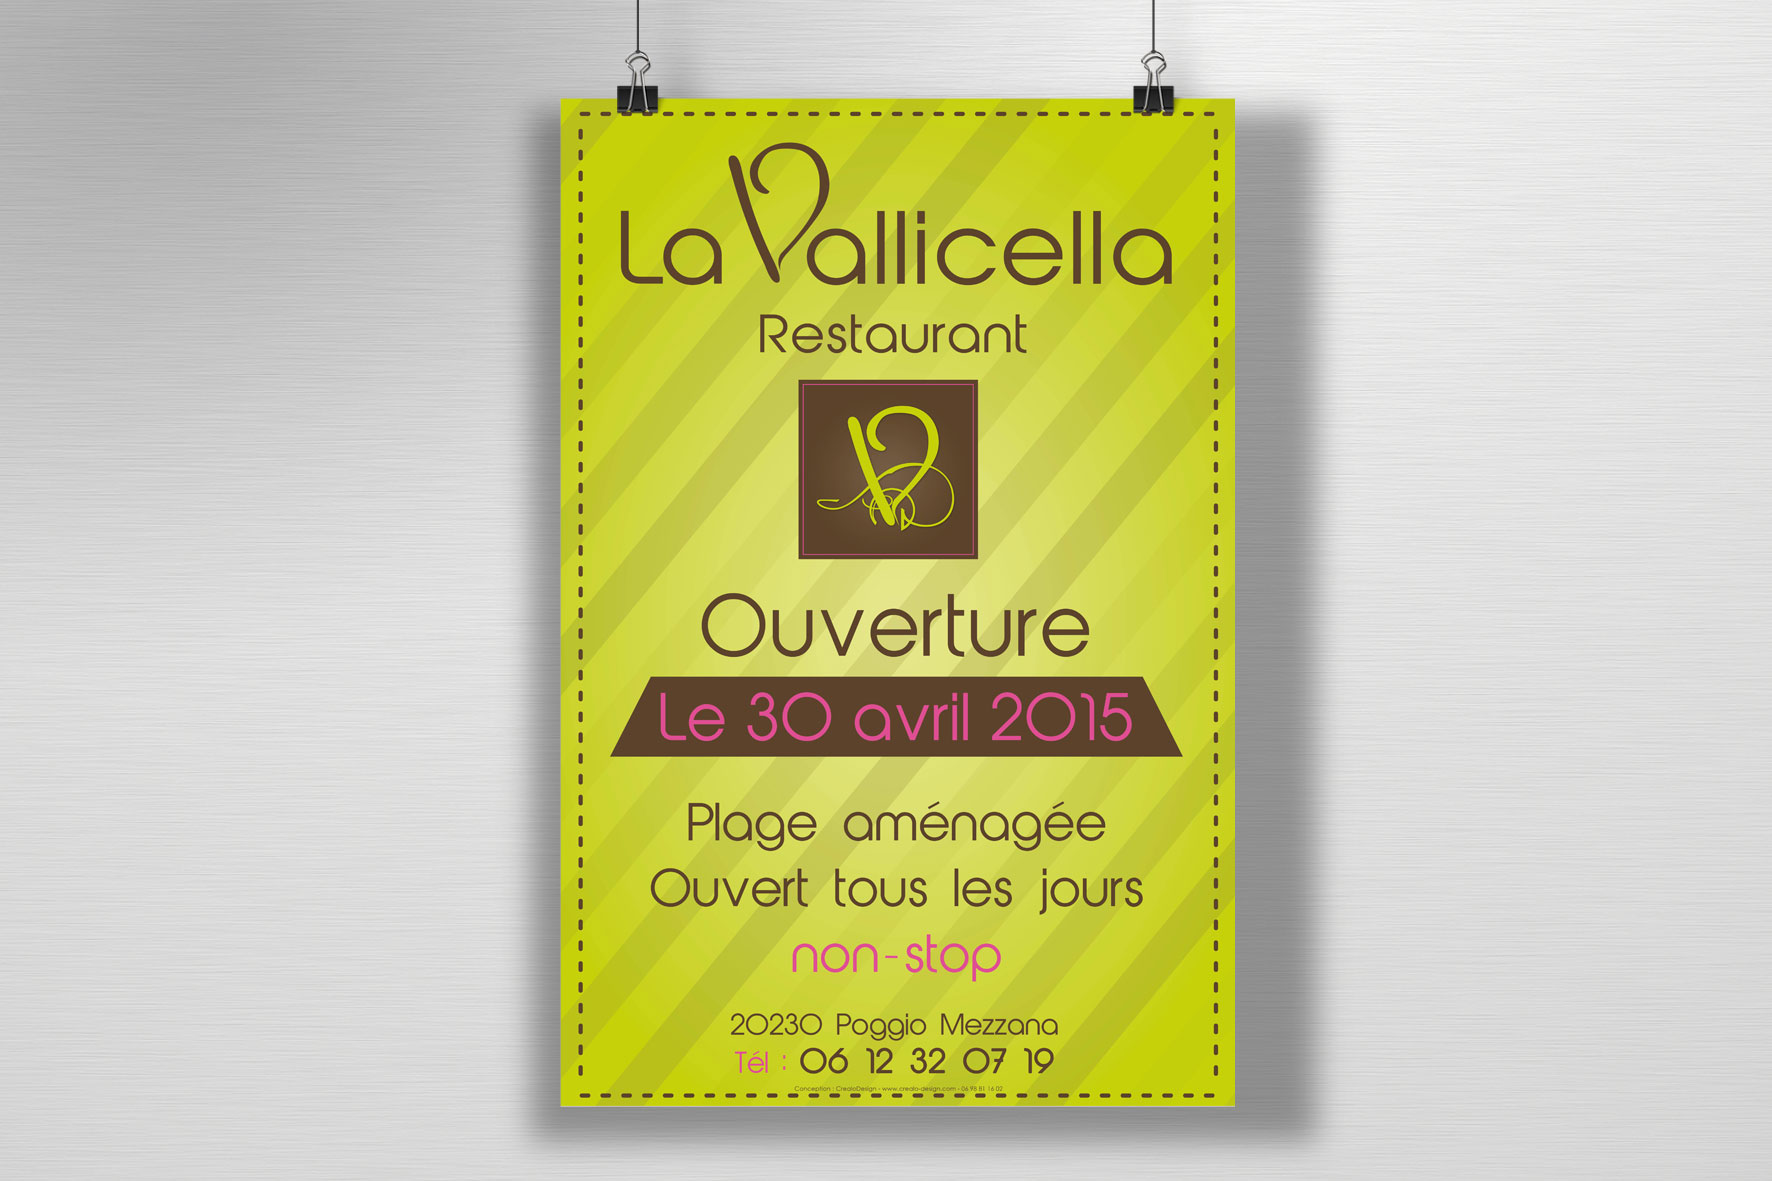 Restaurant La Vallicella